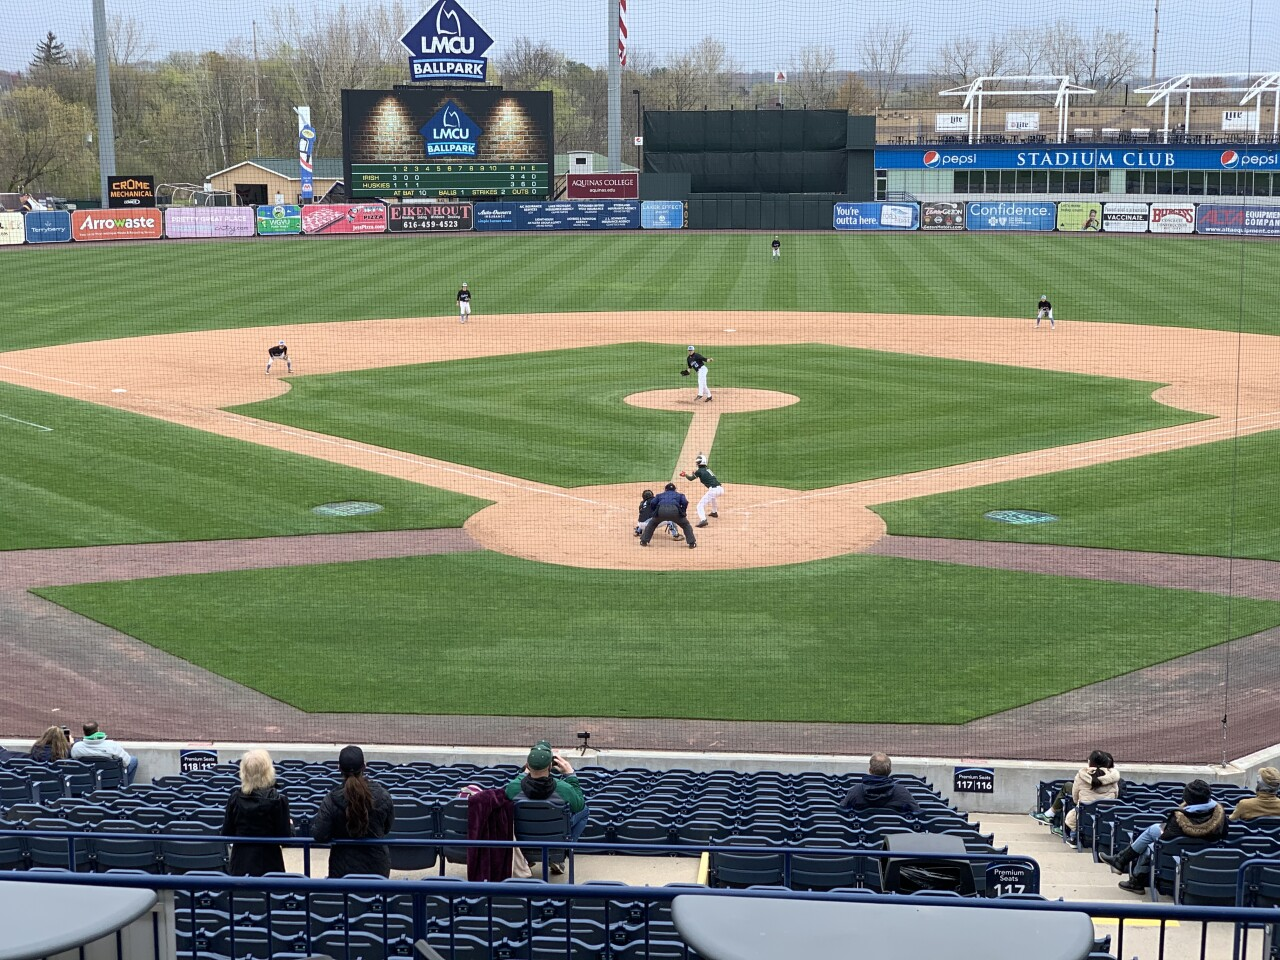 High school baseball at LMCU Ballpark